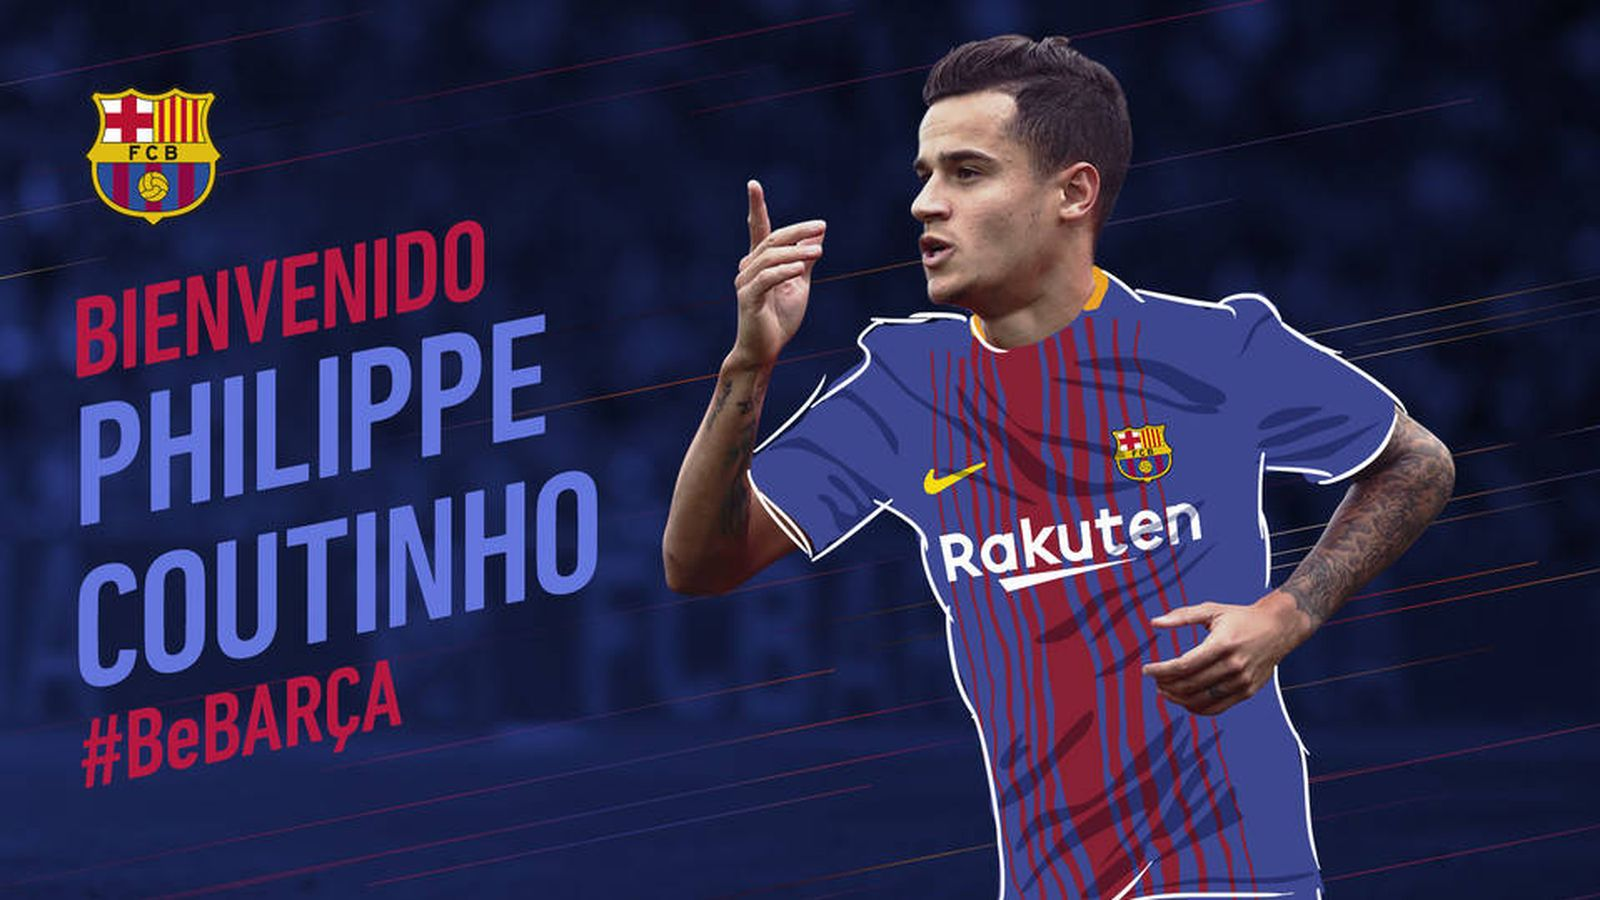 Foto: Así recibió el Barcelona a Coutinho. (FCBarcelona)